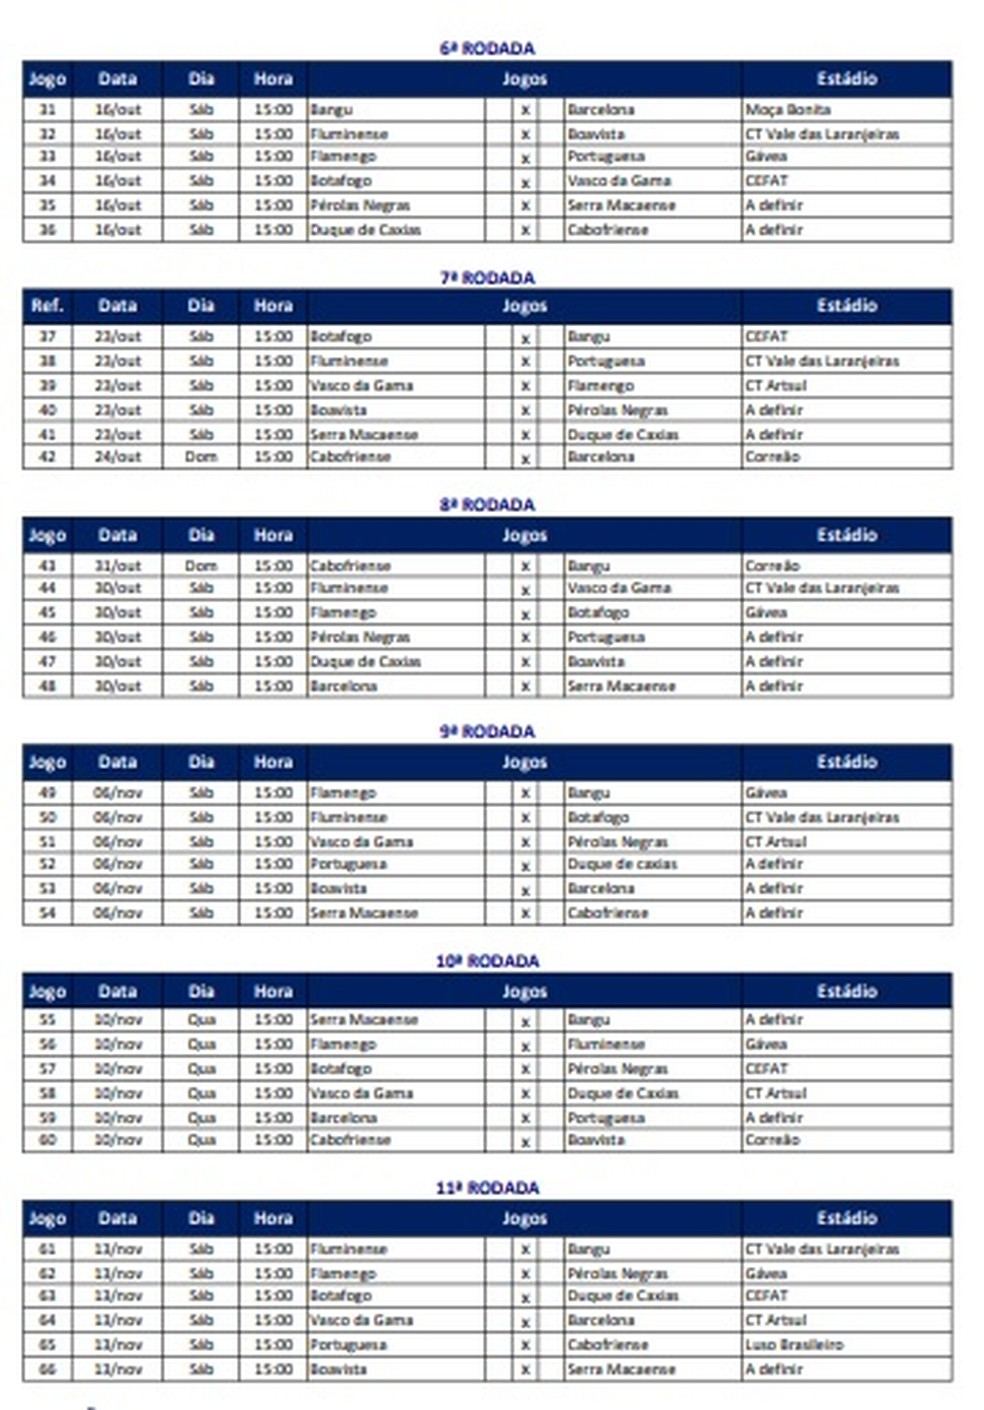 Tabela do Campeonato Carioca feminino